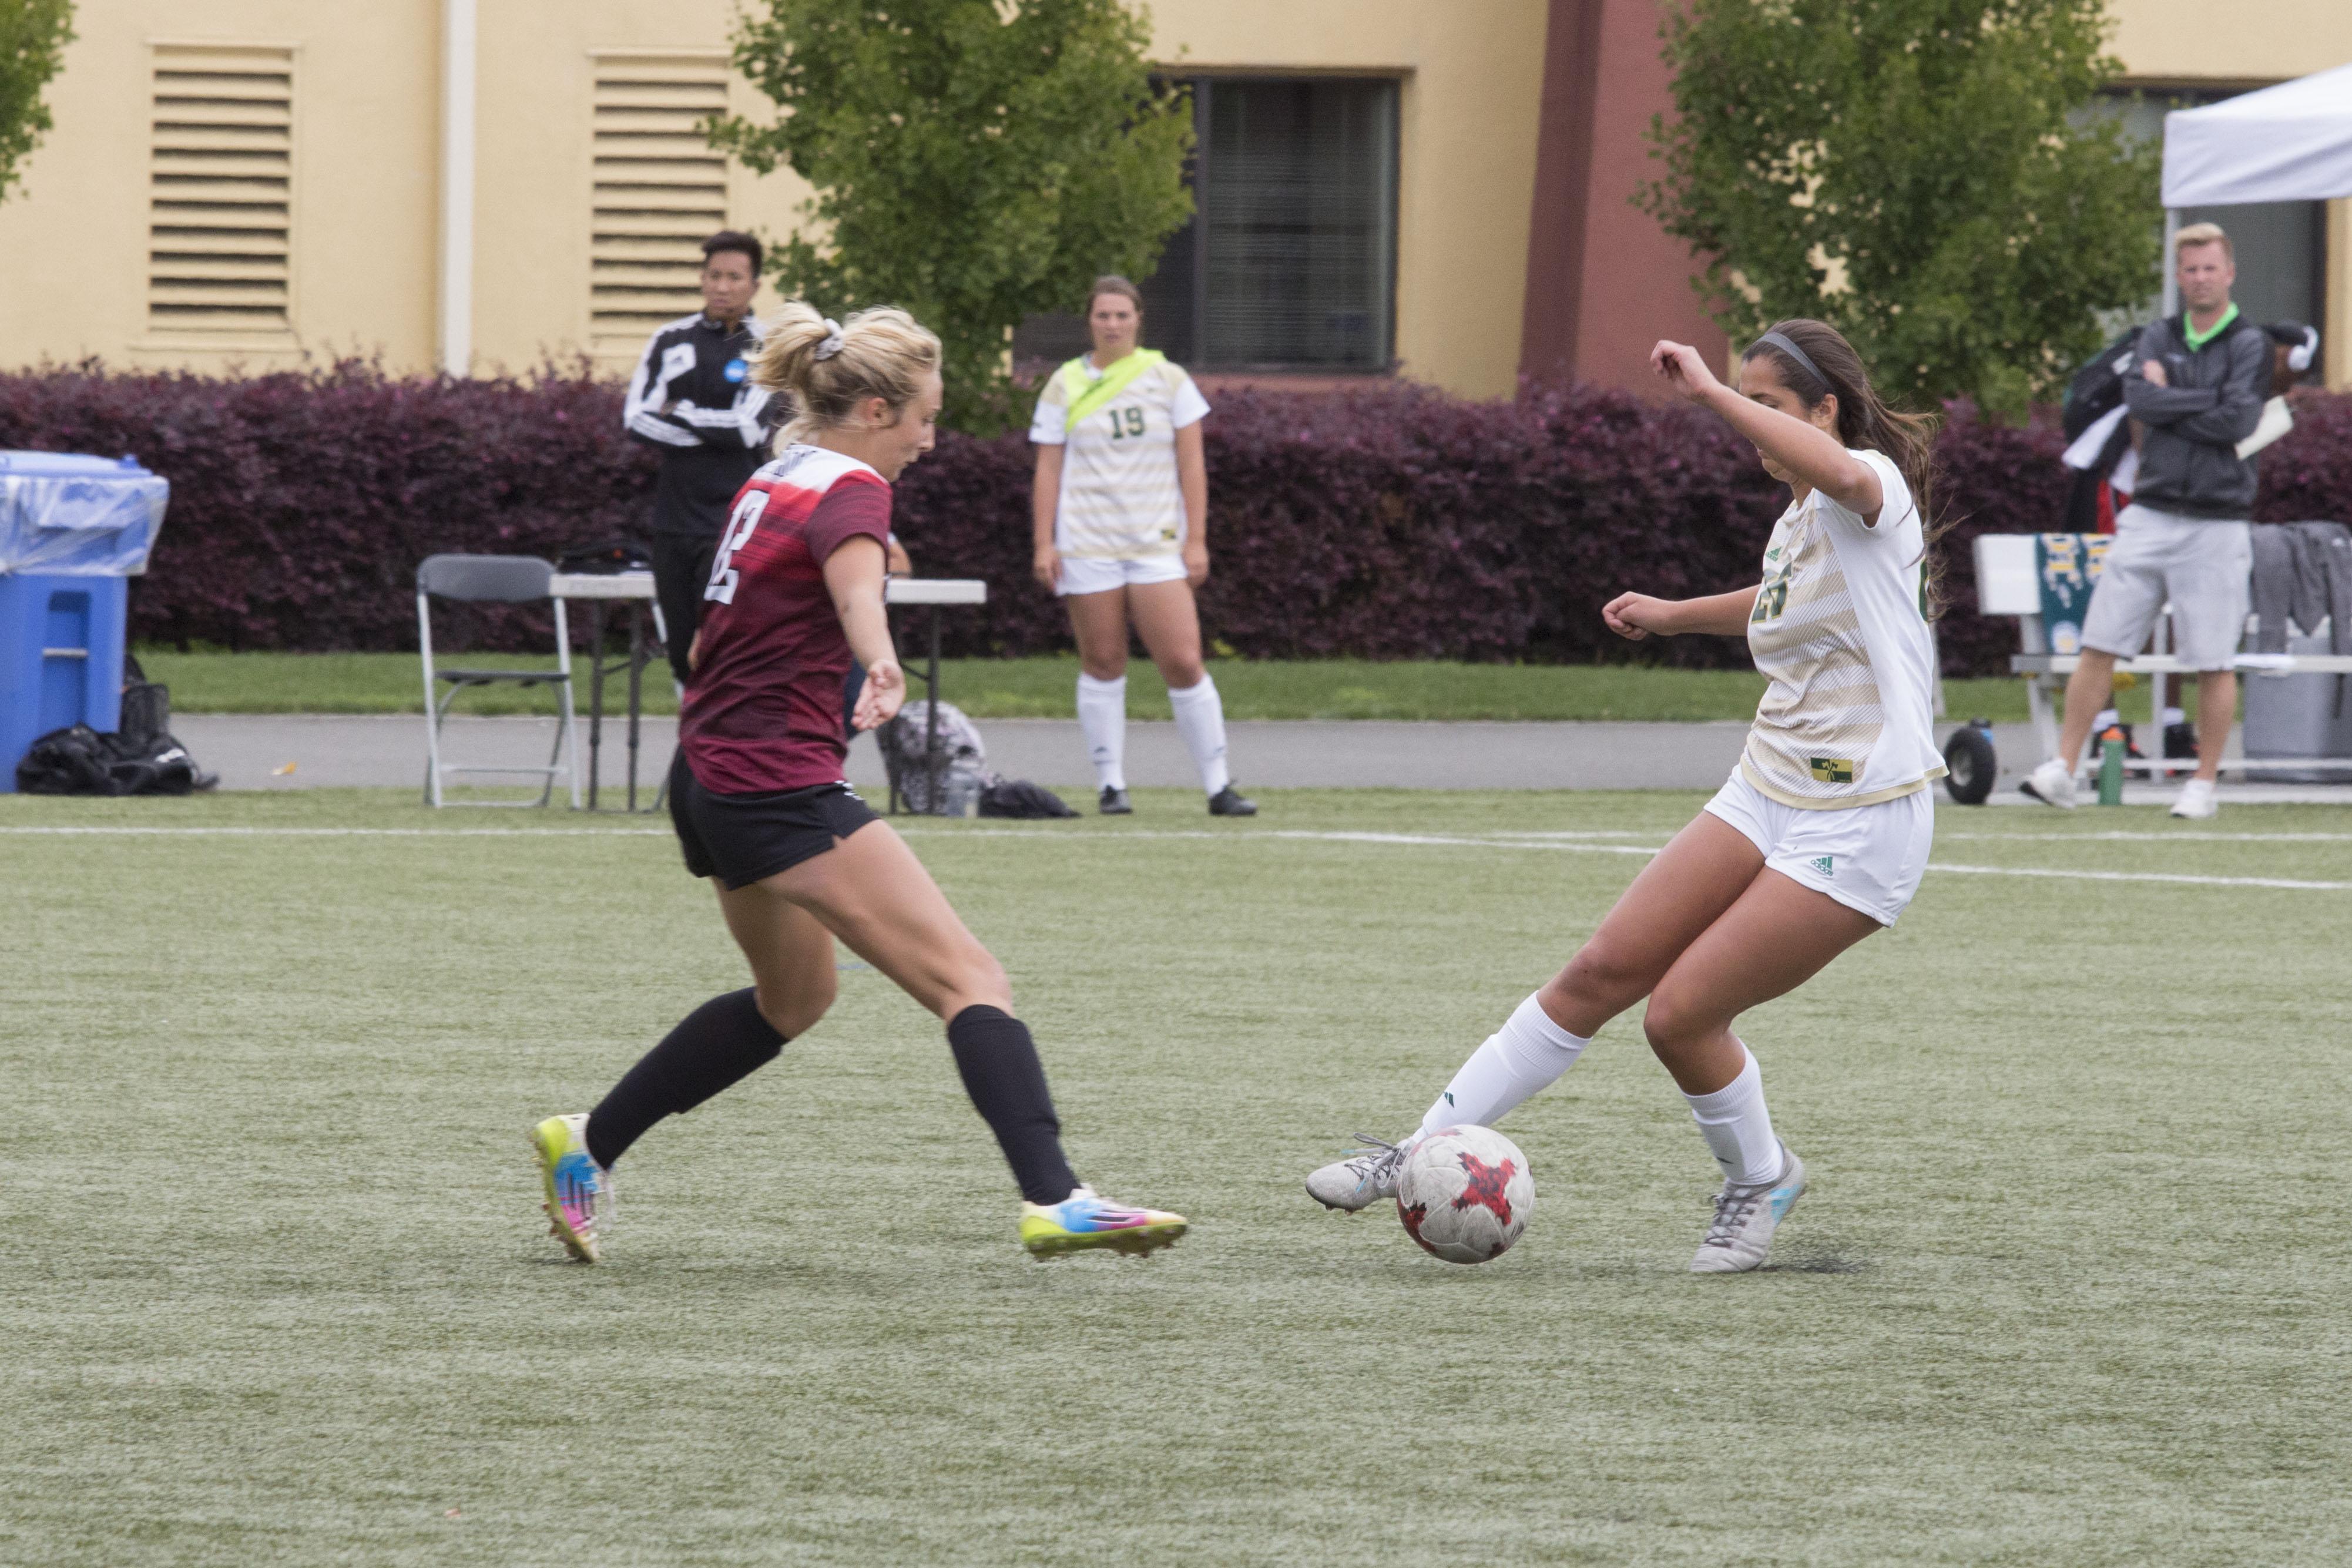 Abbie Jones (left) defending HSU player Erin Seigel (right.) | Photo by Ian Benjamin Finnegan Thompson